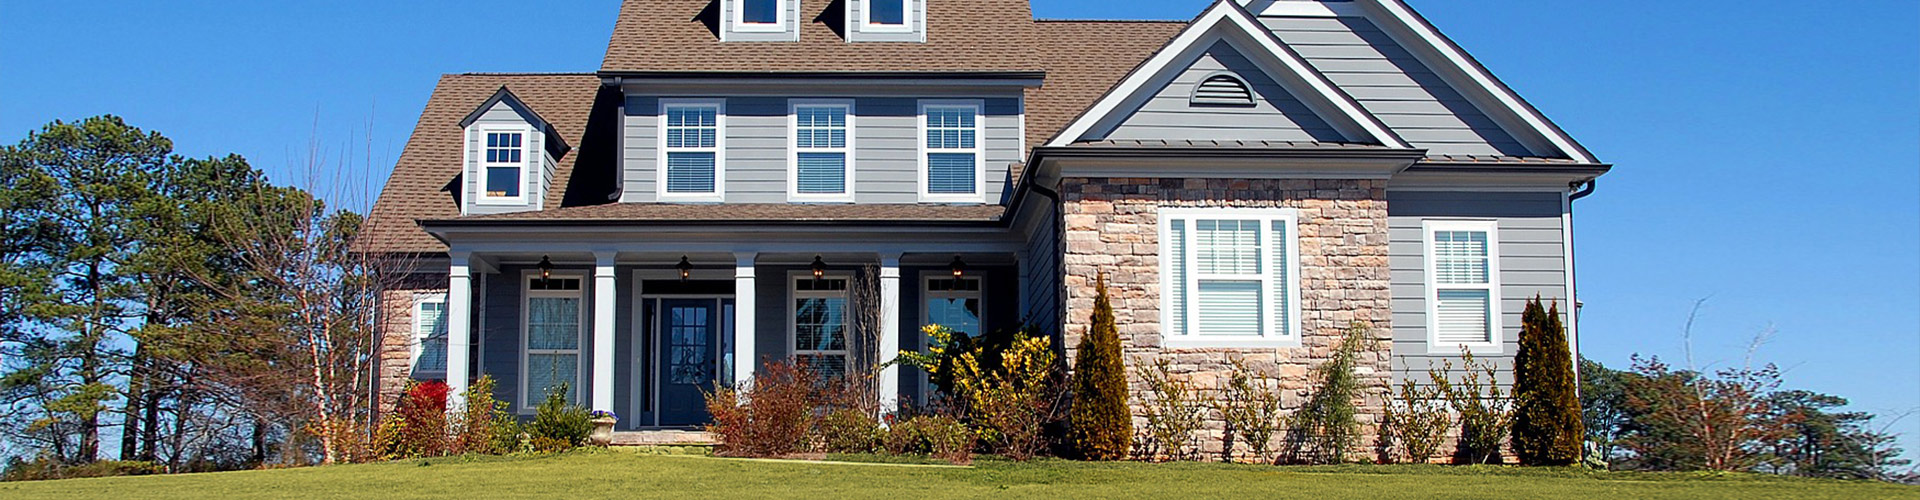 Home Insurance in Jamestown, Fargo ND, North Dakota